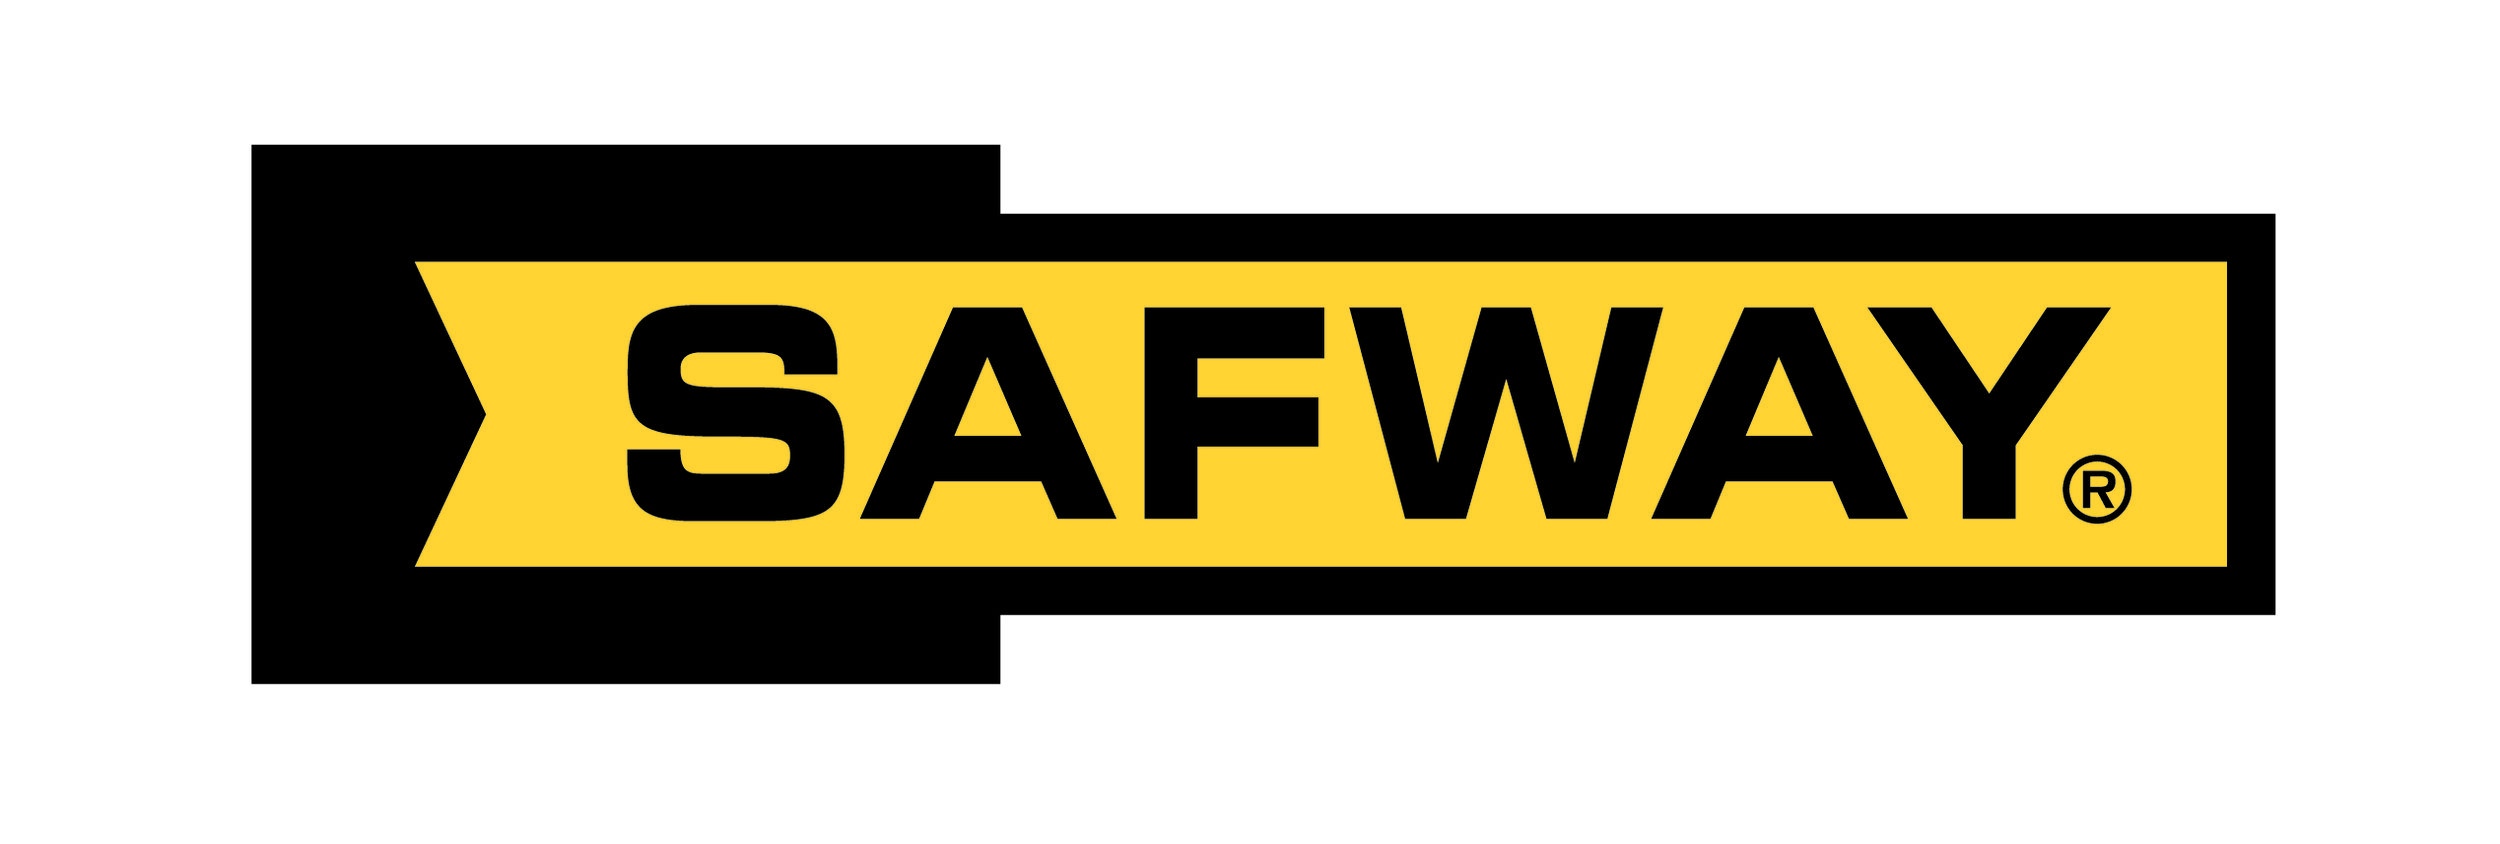 SafwayLogo_FullColor_flag.jpg